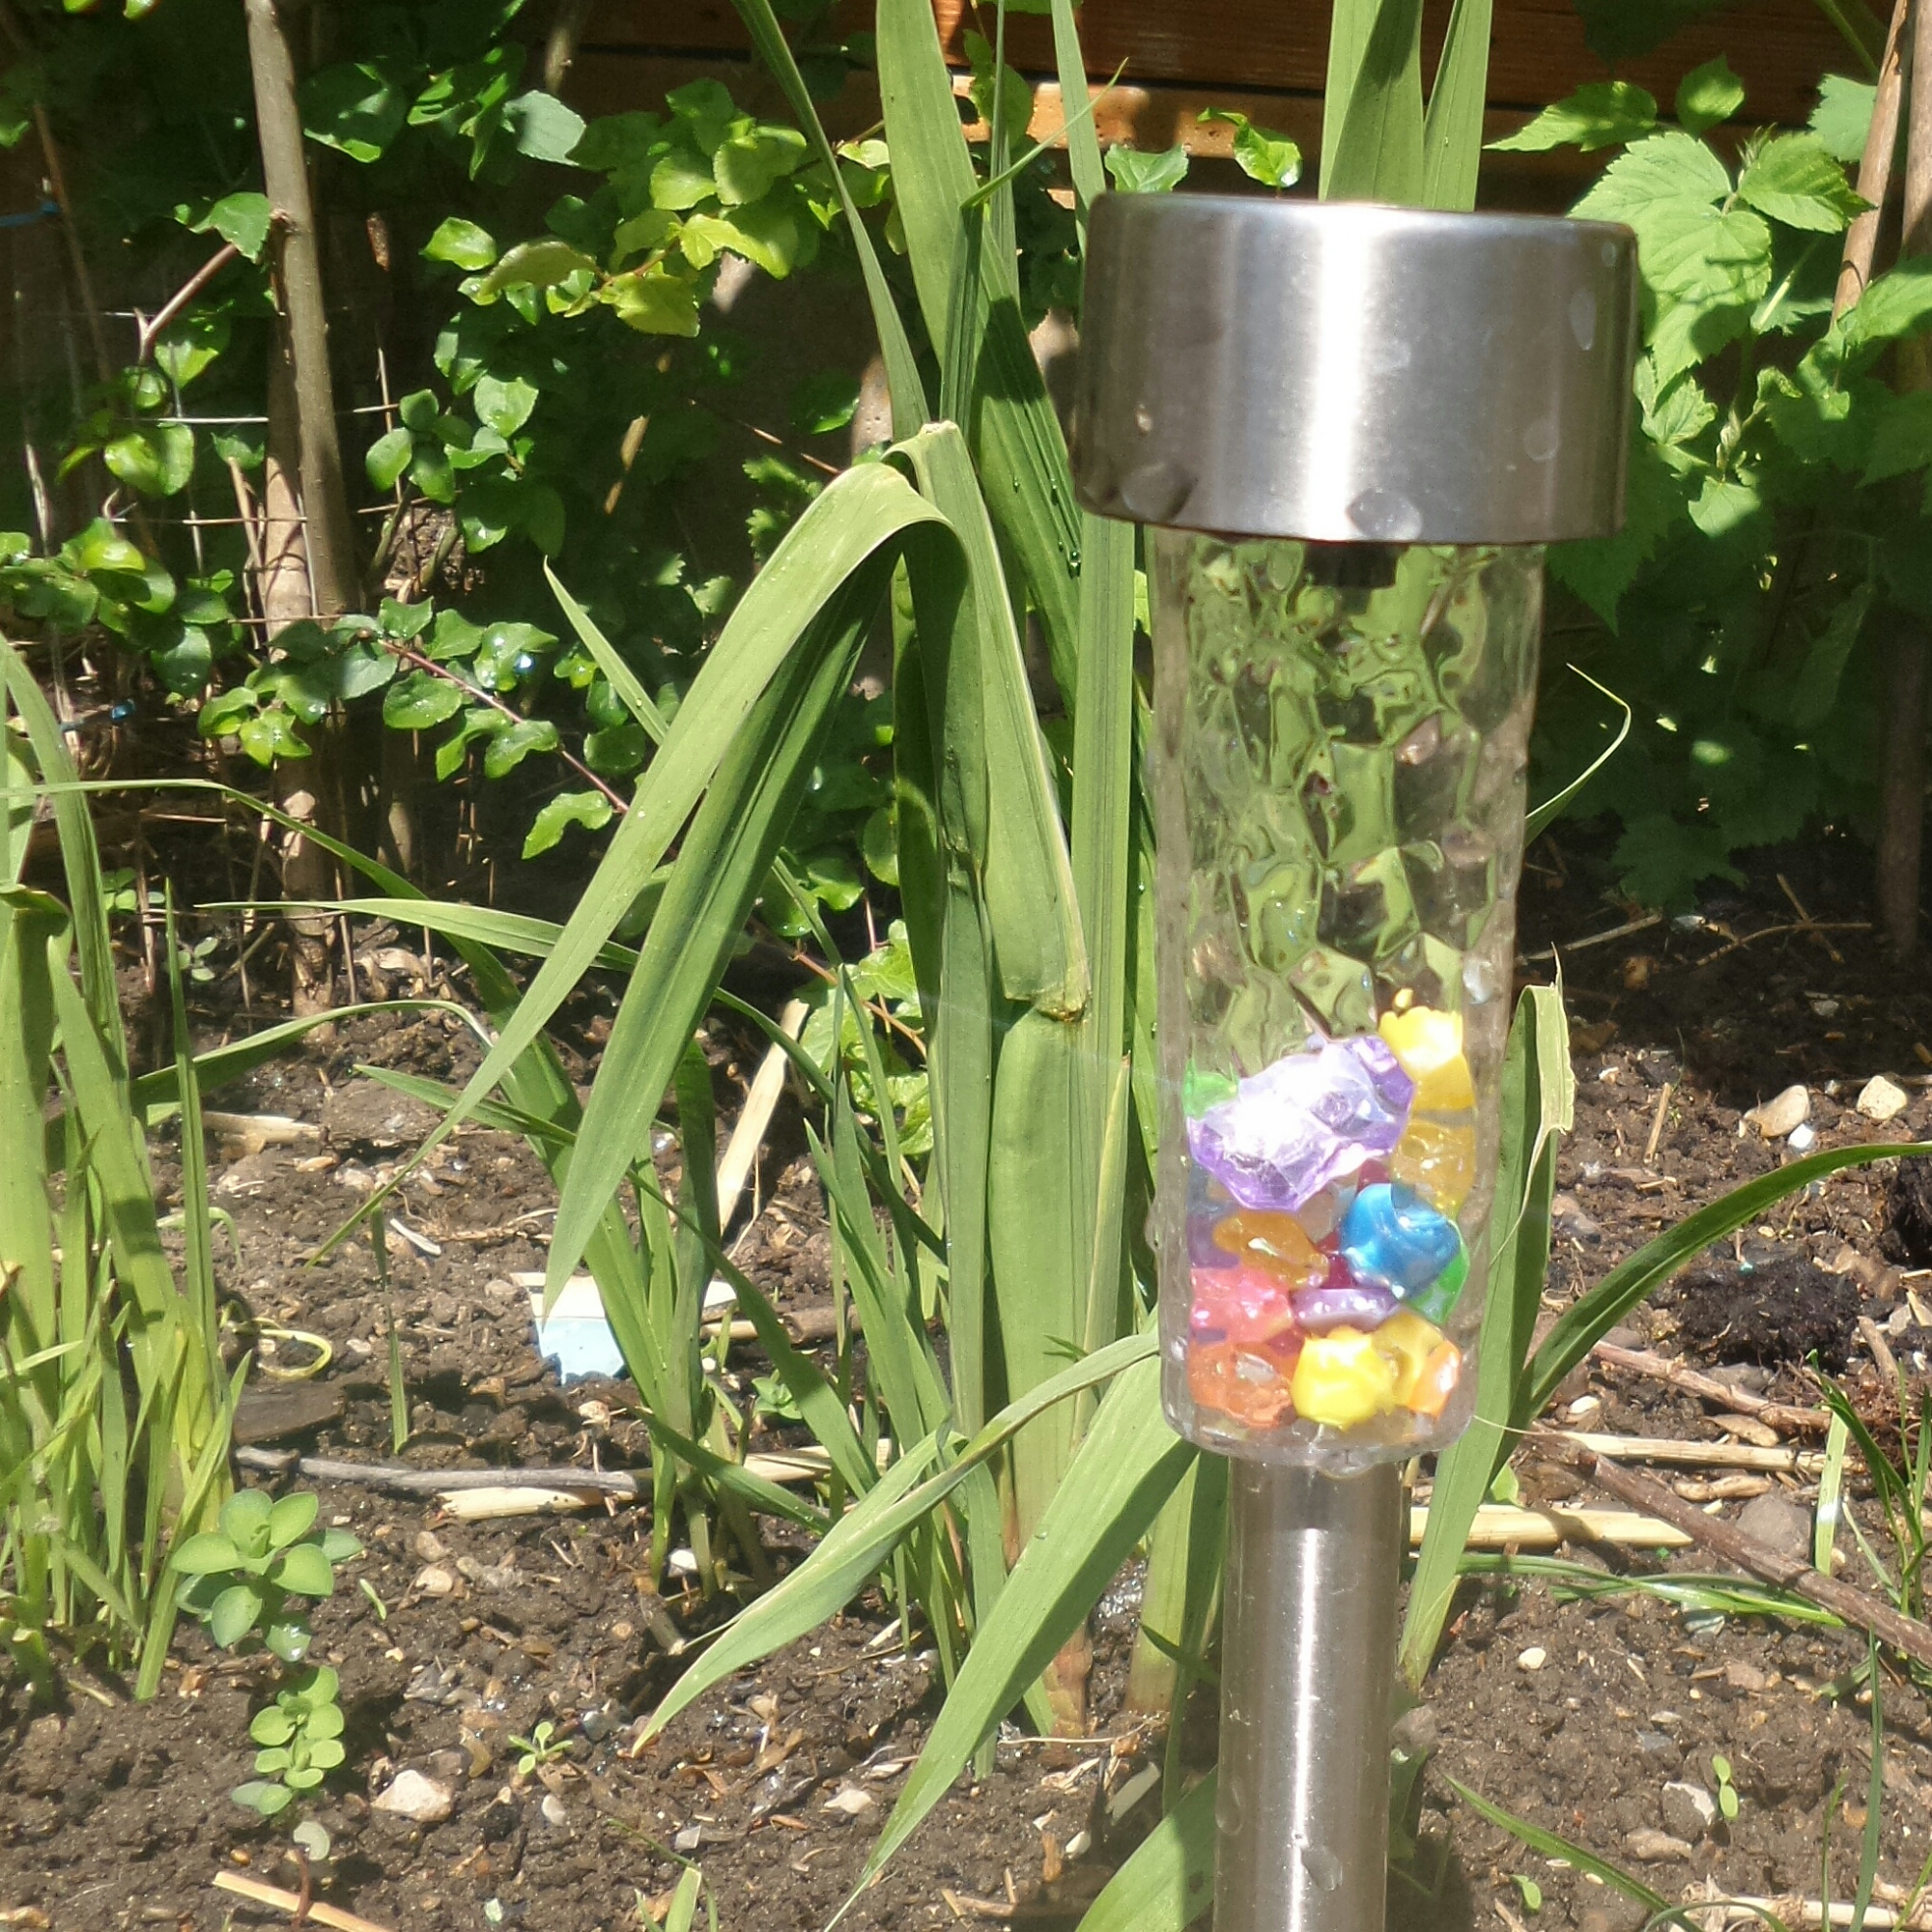 Outdoor Solar Lights Wilko: Cheap Unique Solar Garden Lights ⋆ Julie's Notebook